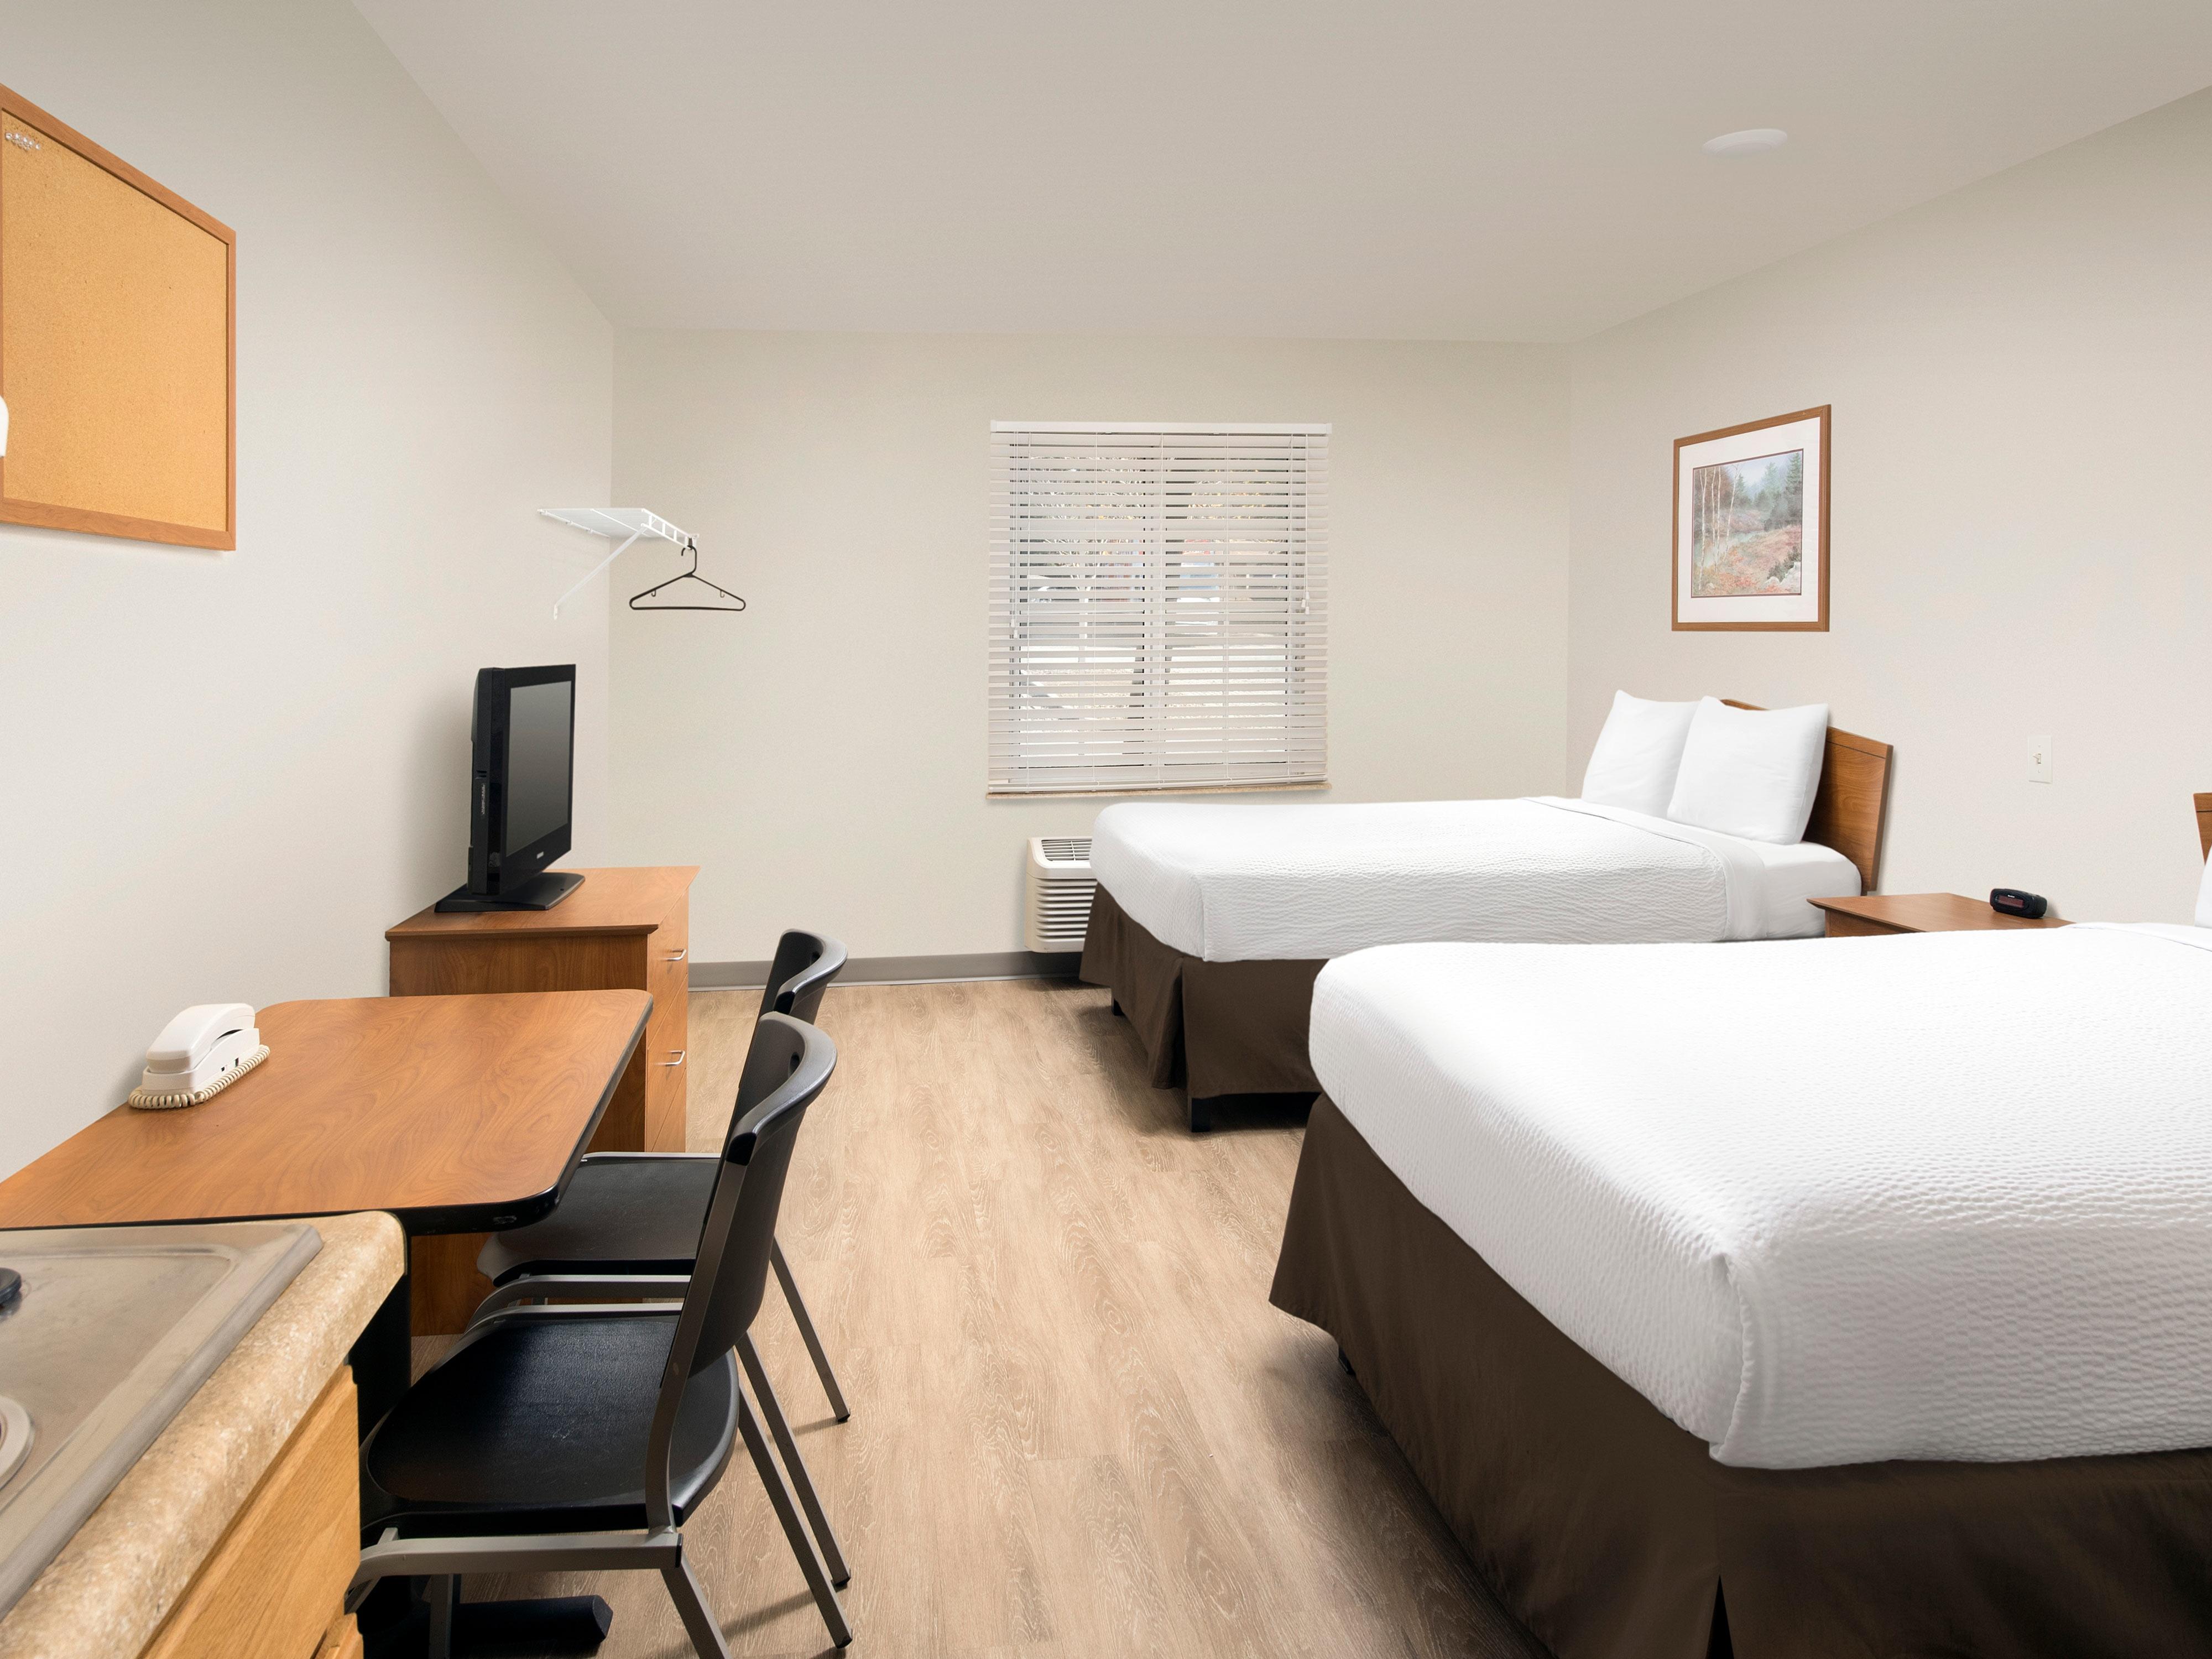 WoodSpring Suites Pensacola Northeast image 0